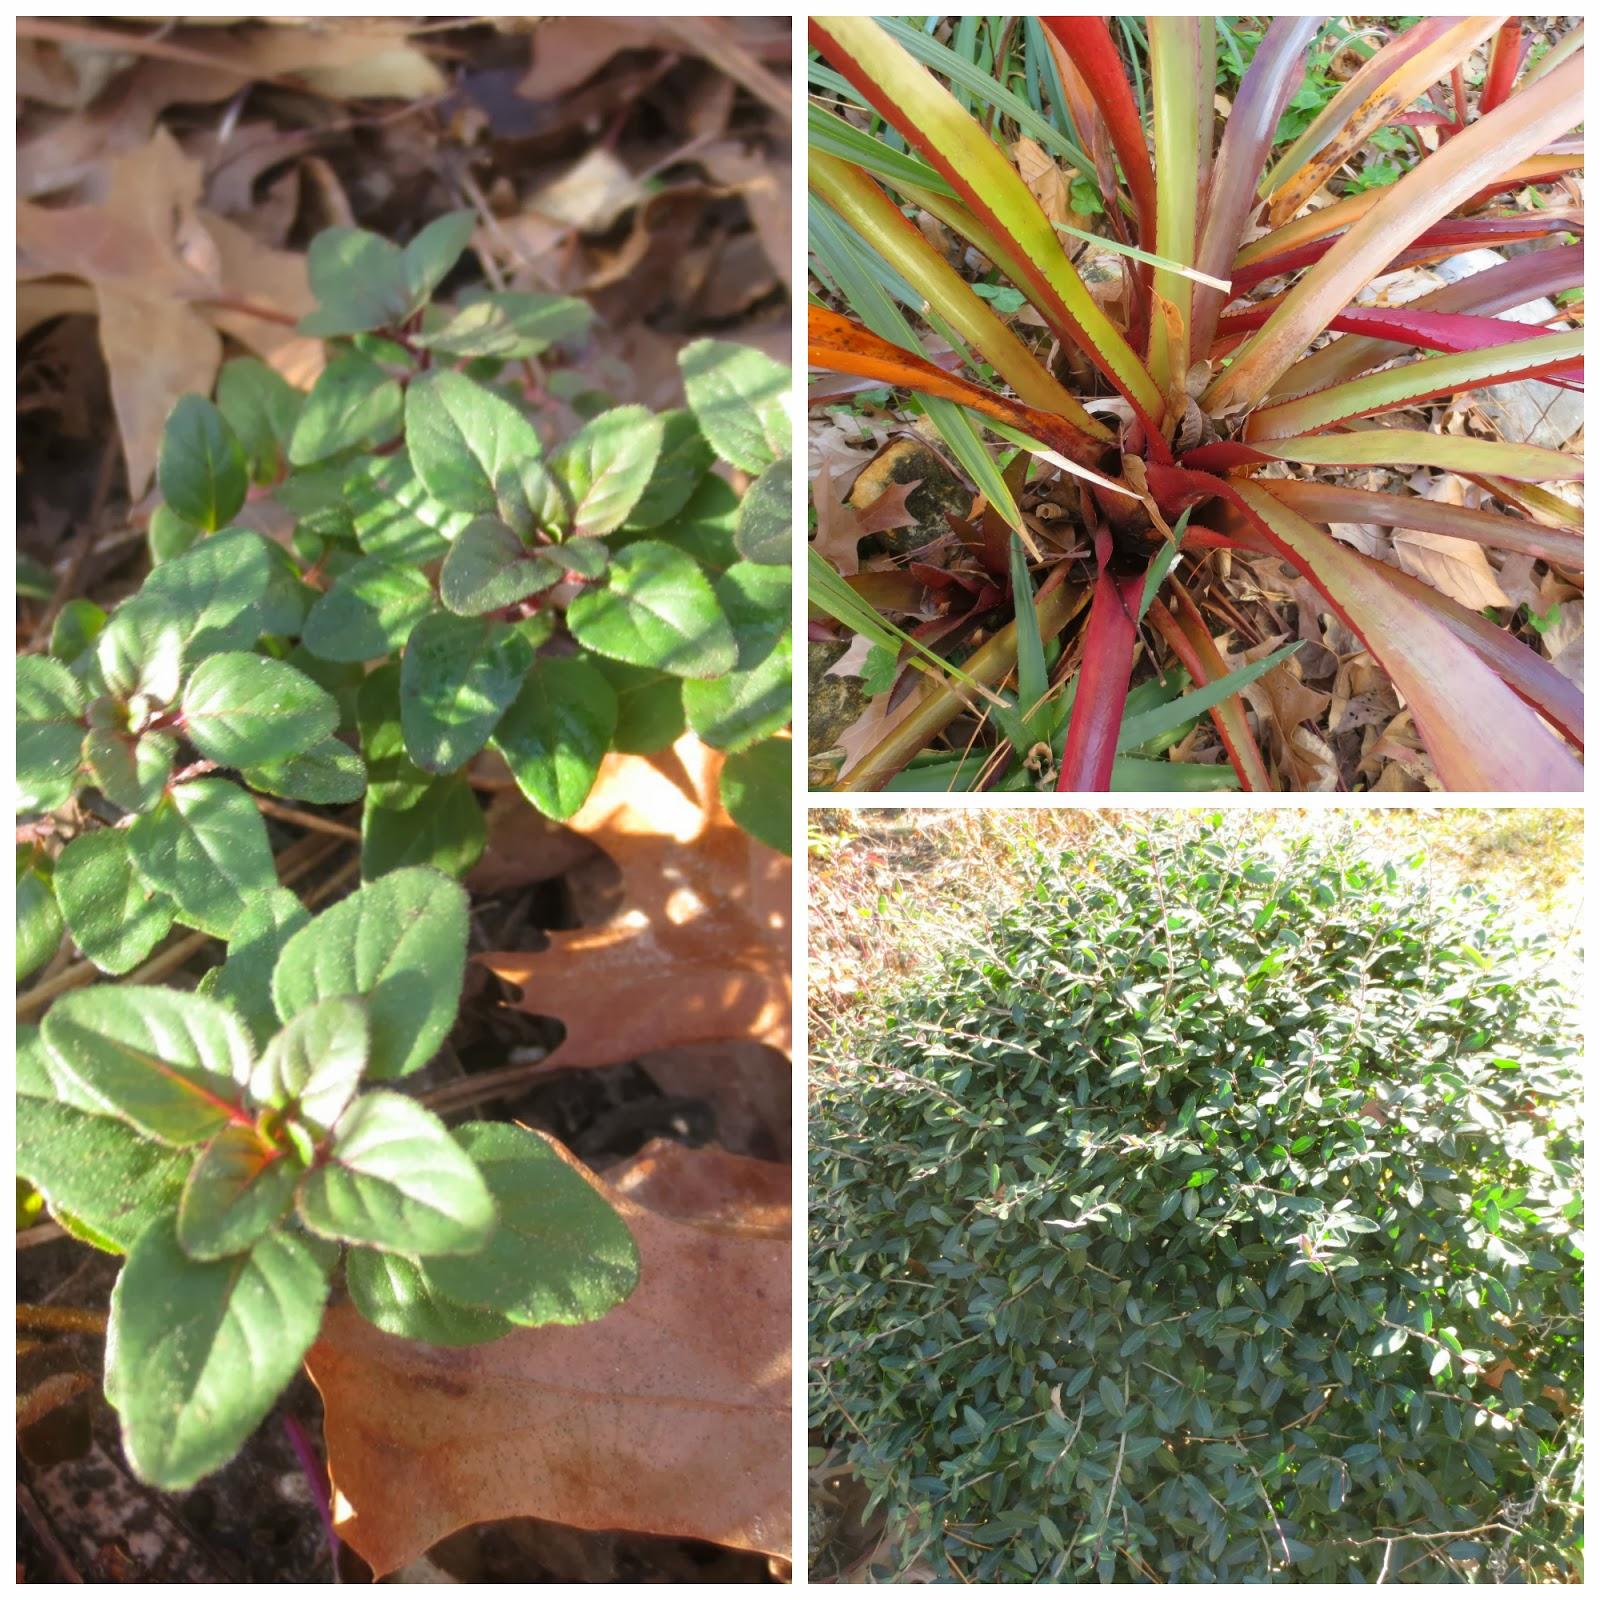 Tropical Texana: The TEXAS COTTAGE GARDEN: 50 PLANTS THAT